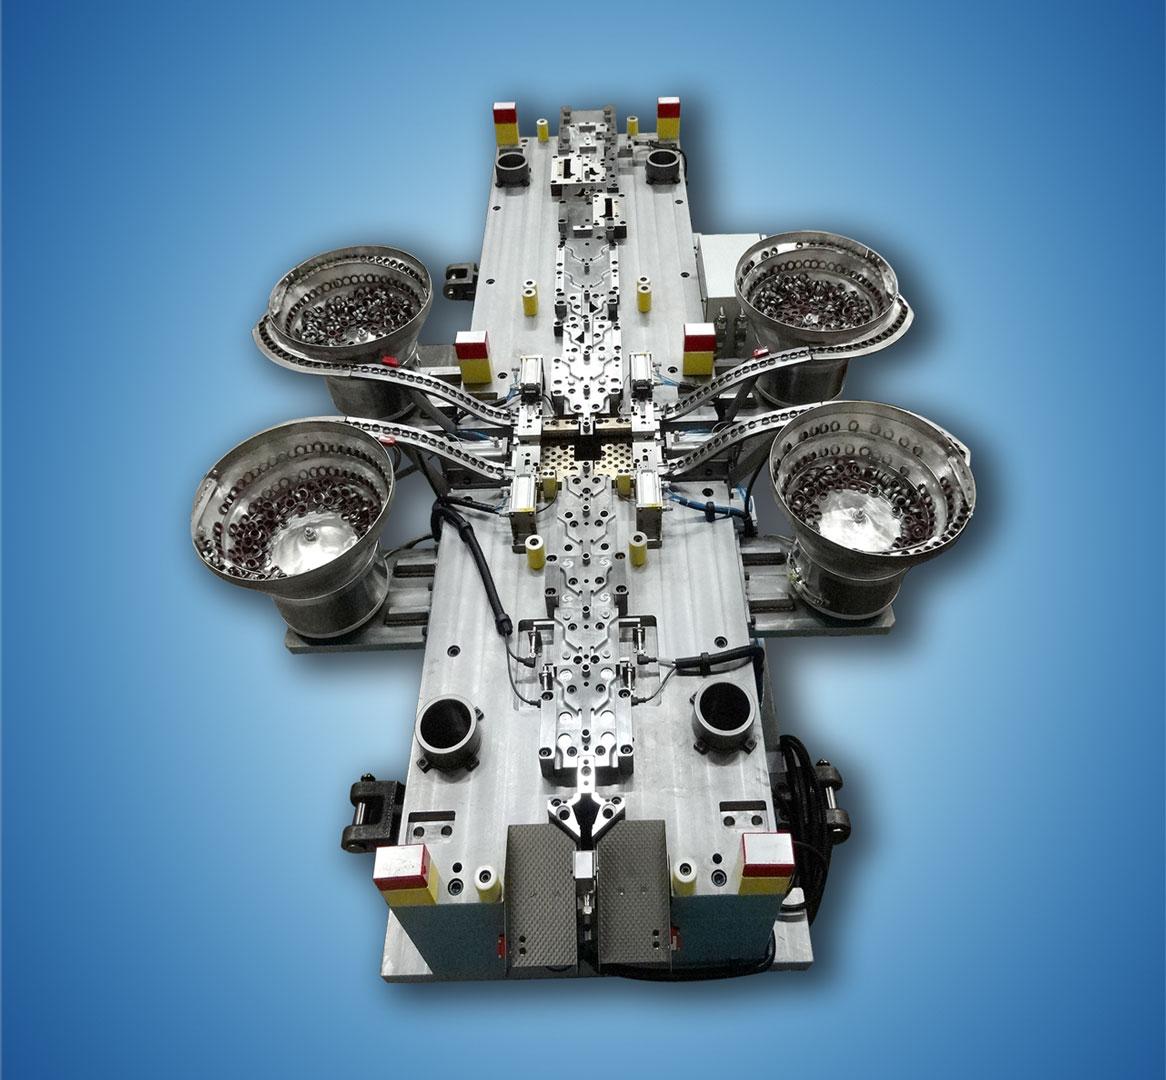 Ero-Projekt-d.o.o.-Toolshop-Werkzeugbau-4-Orodje-za-preoblikov--plocevine-_-slika-3